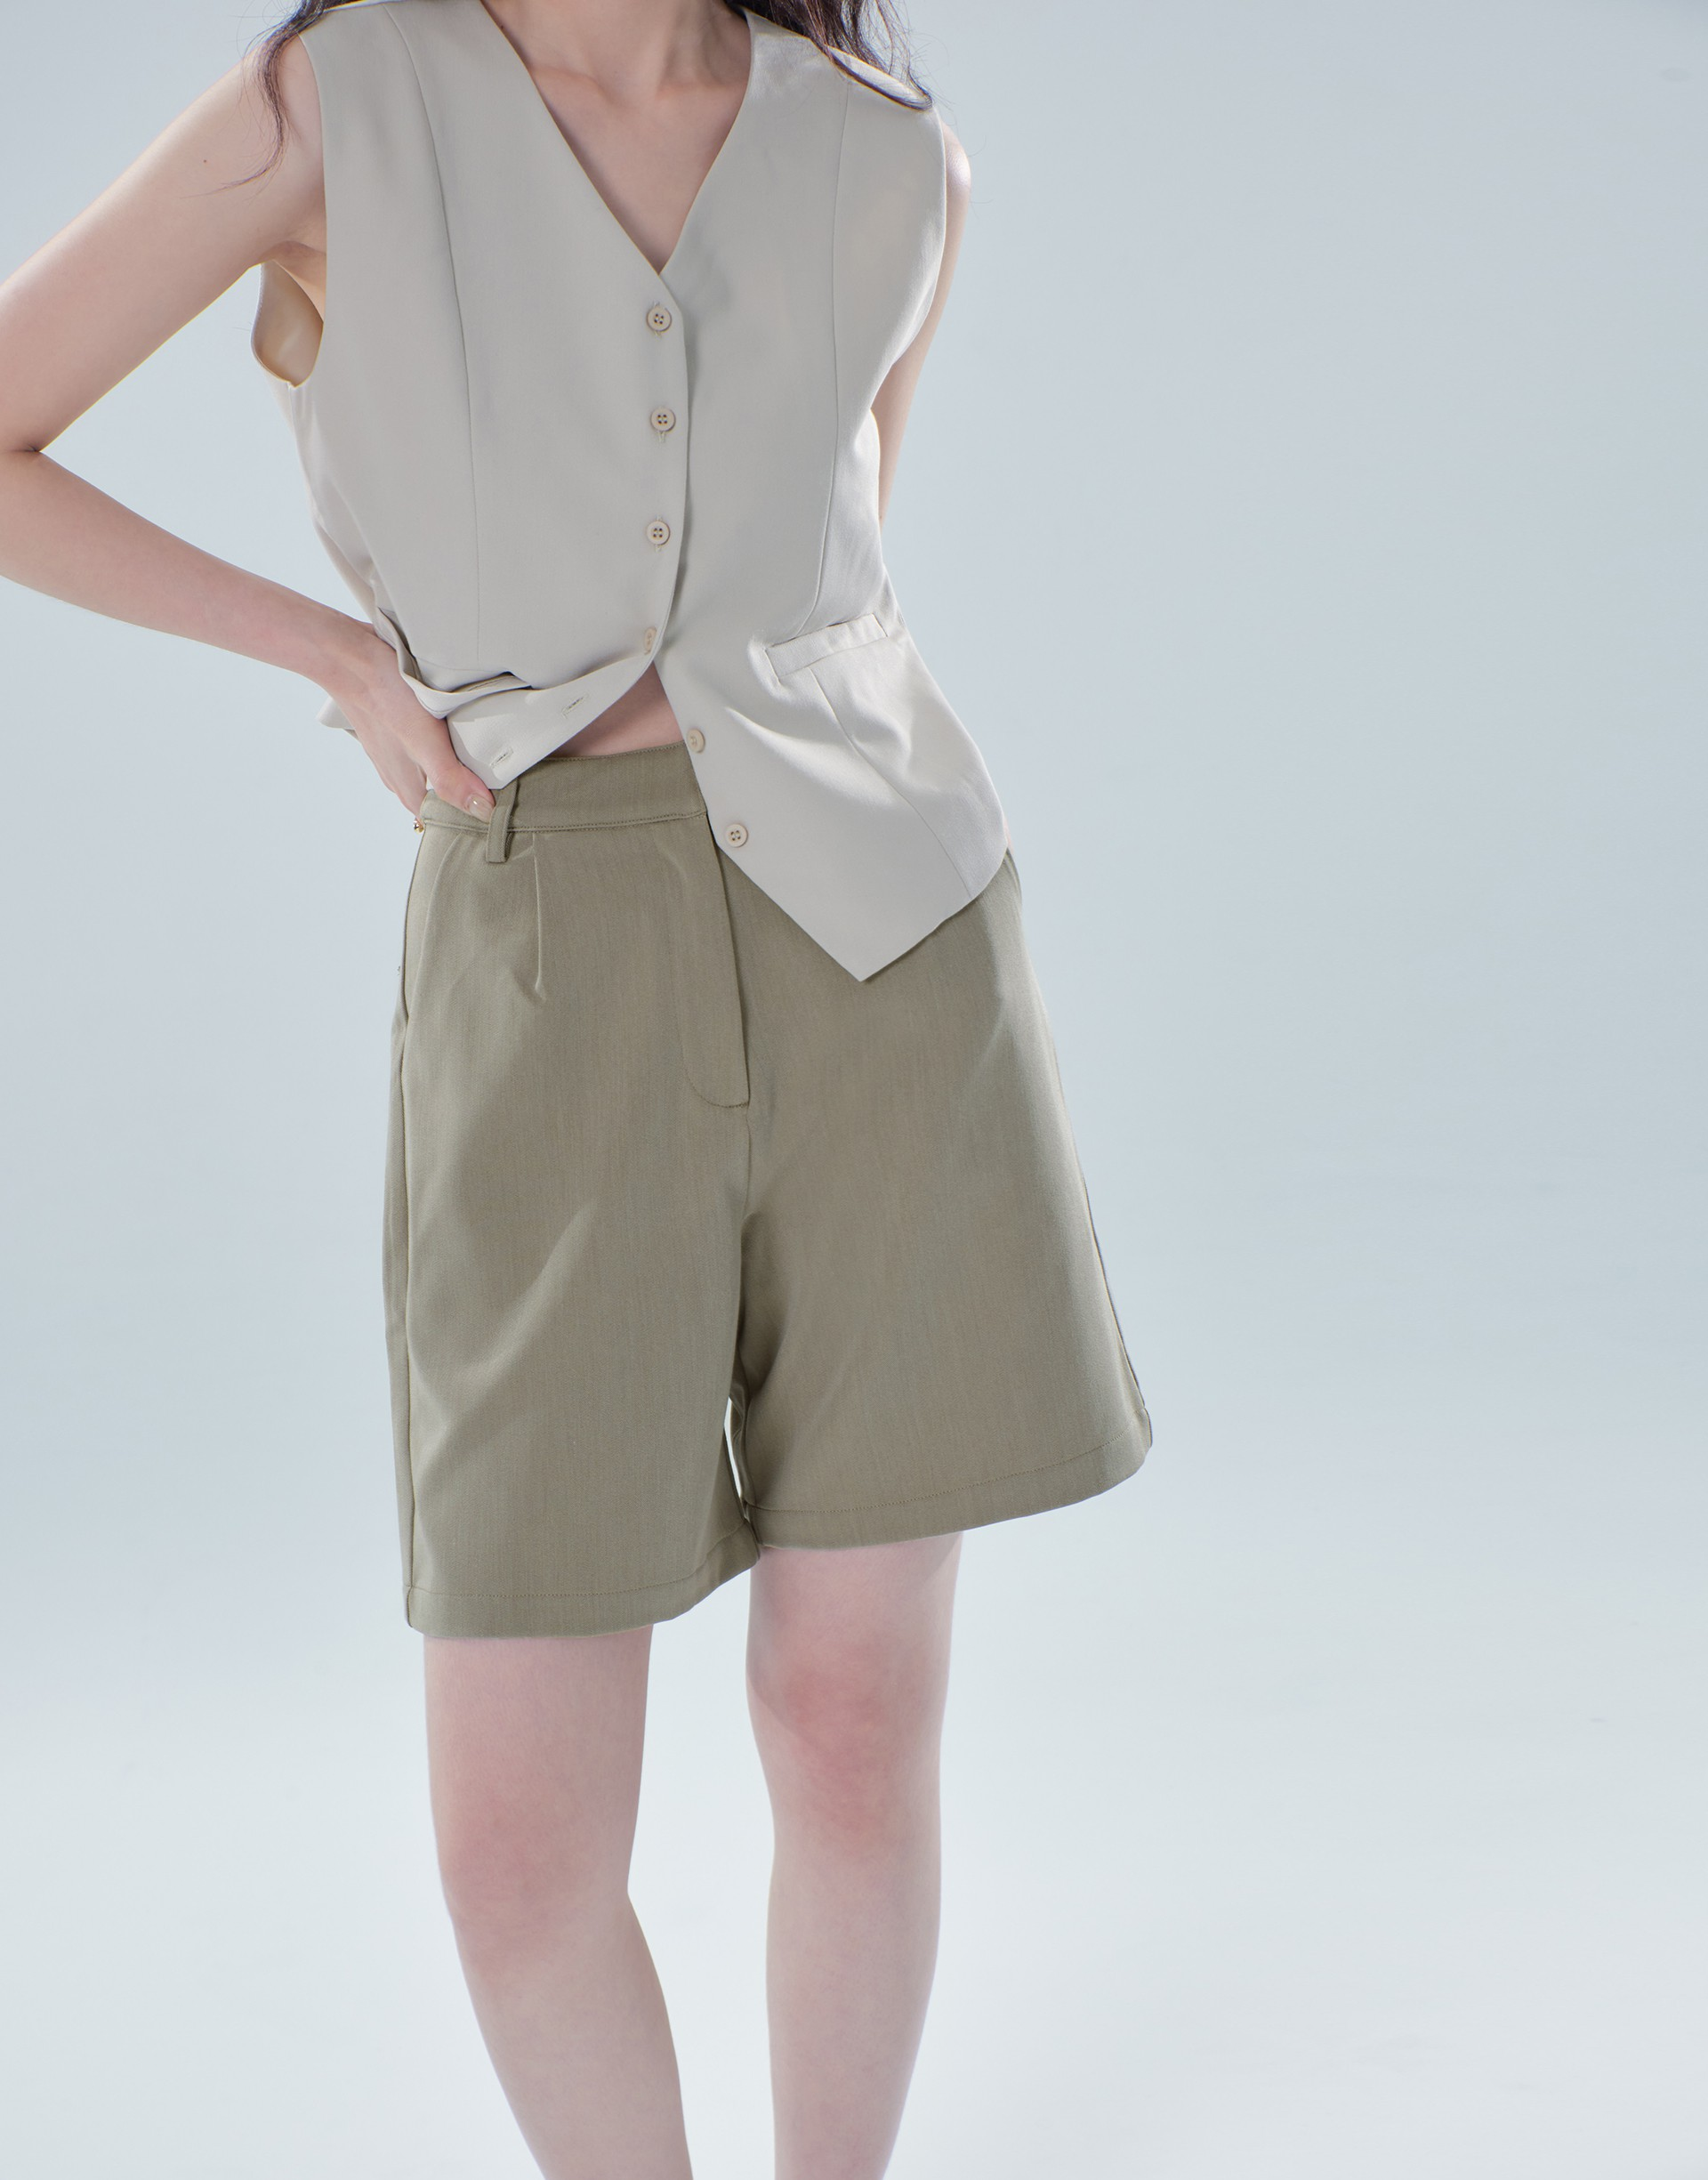 MORE REAL 西裝短褲(楊丞琳限定款)-PAZZO